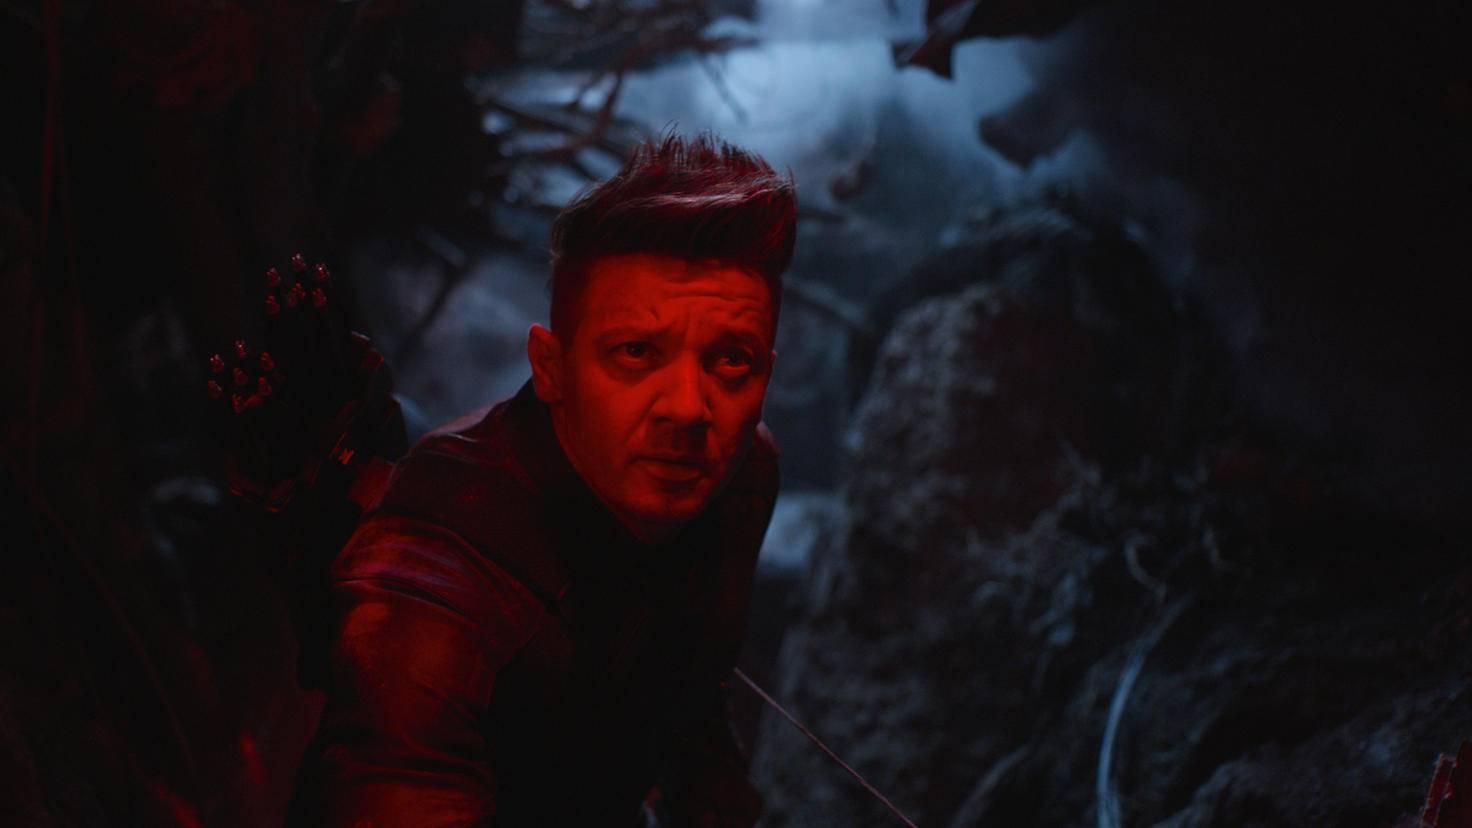 Jeremy Renner als Hawkeye Ronin in Avengers Endgame